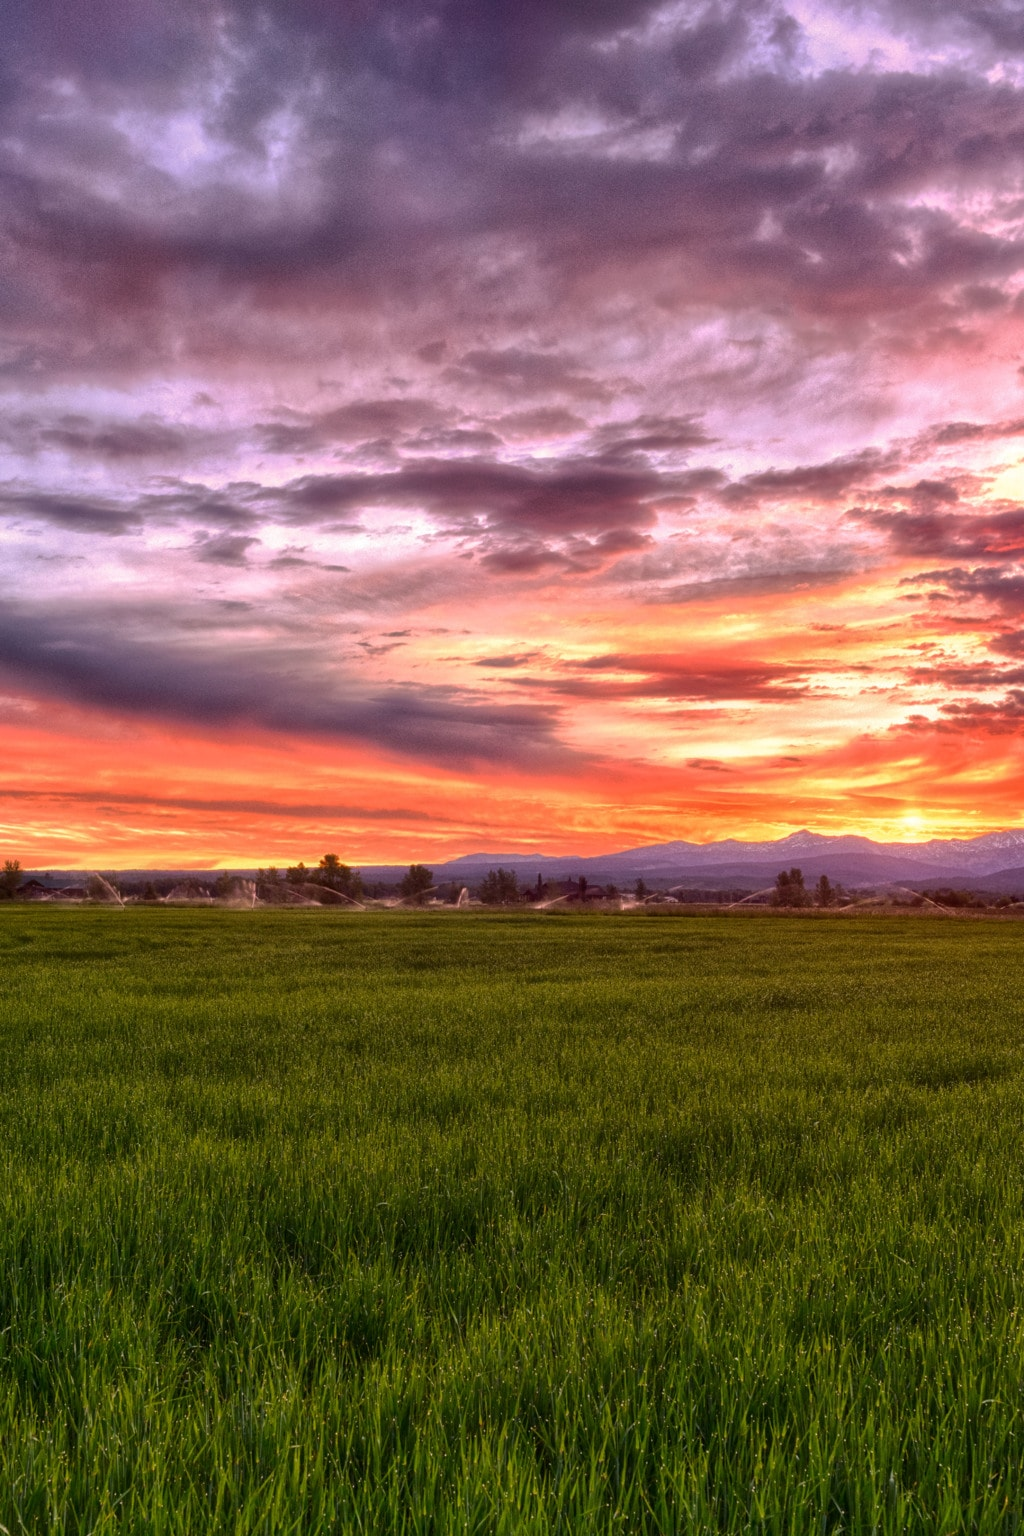 Mountain Sunrise via Stacy White